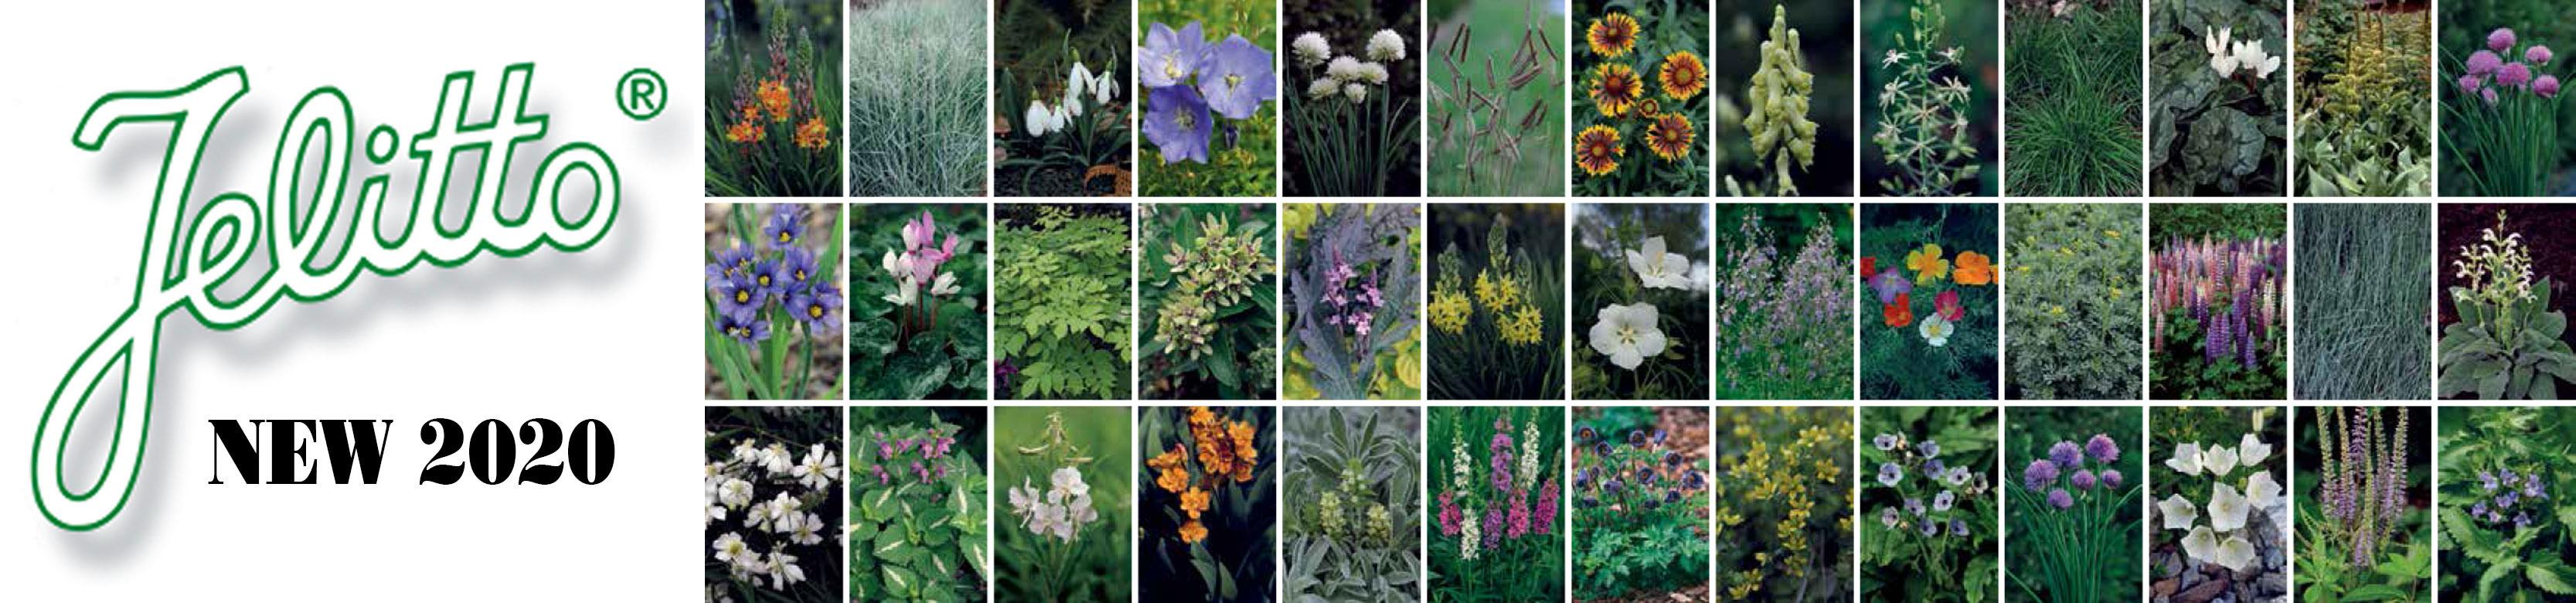 Jelitto Perennial Seed Staudensamen Graines De Plantes Vivaces